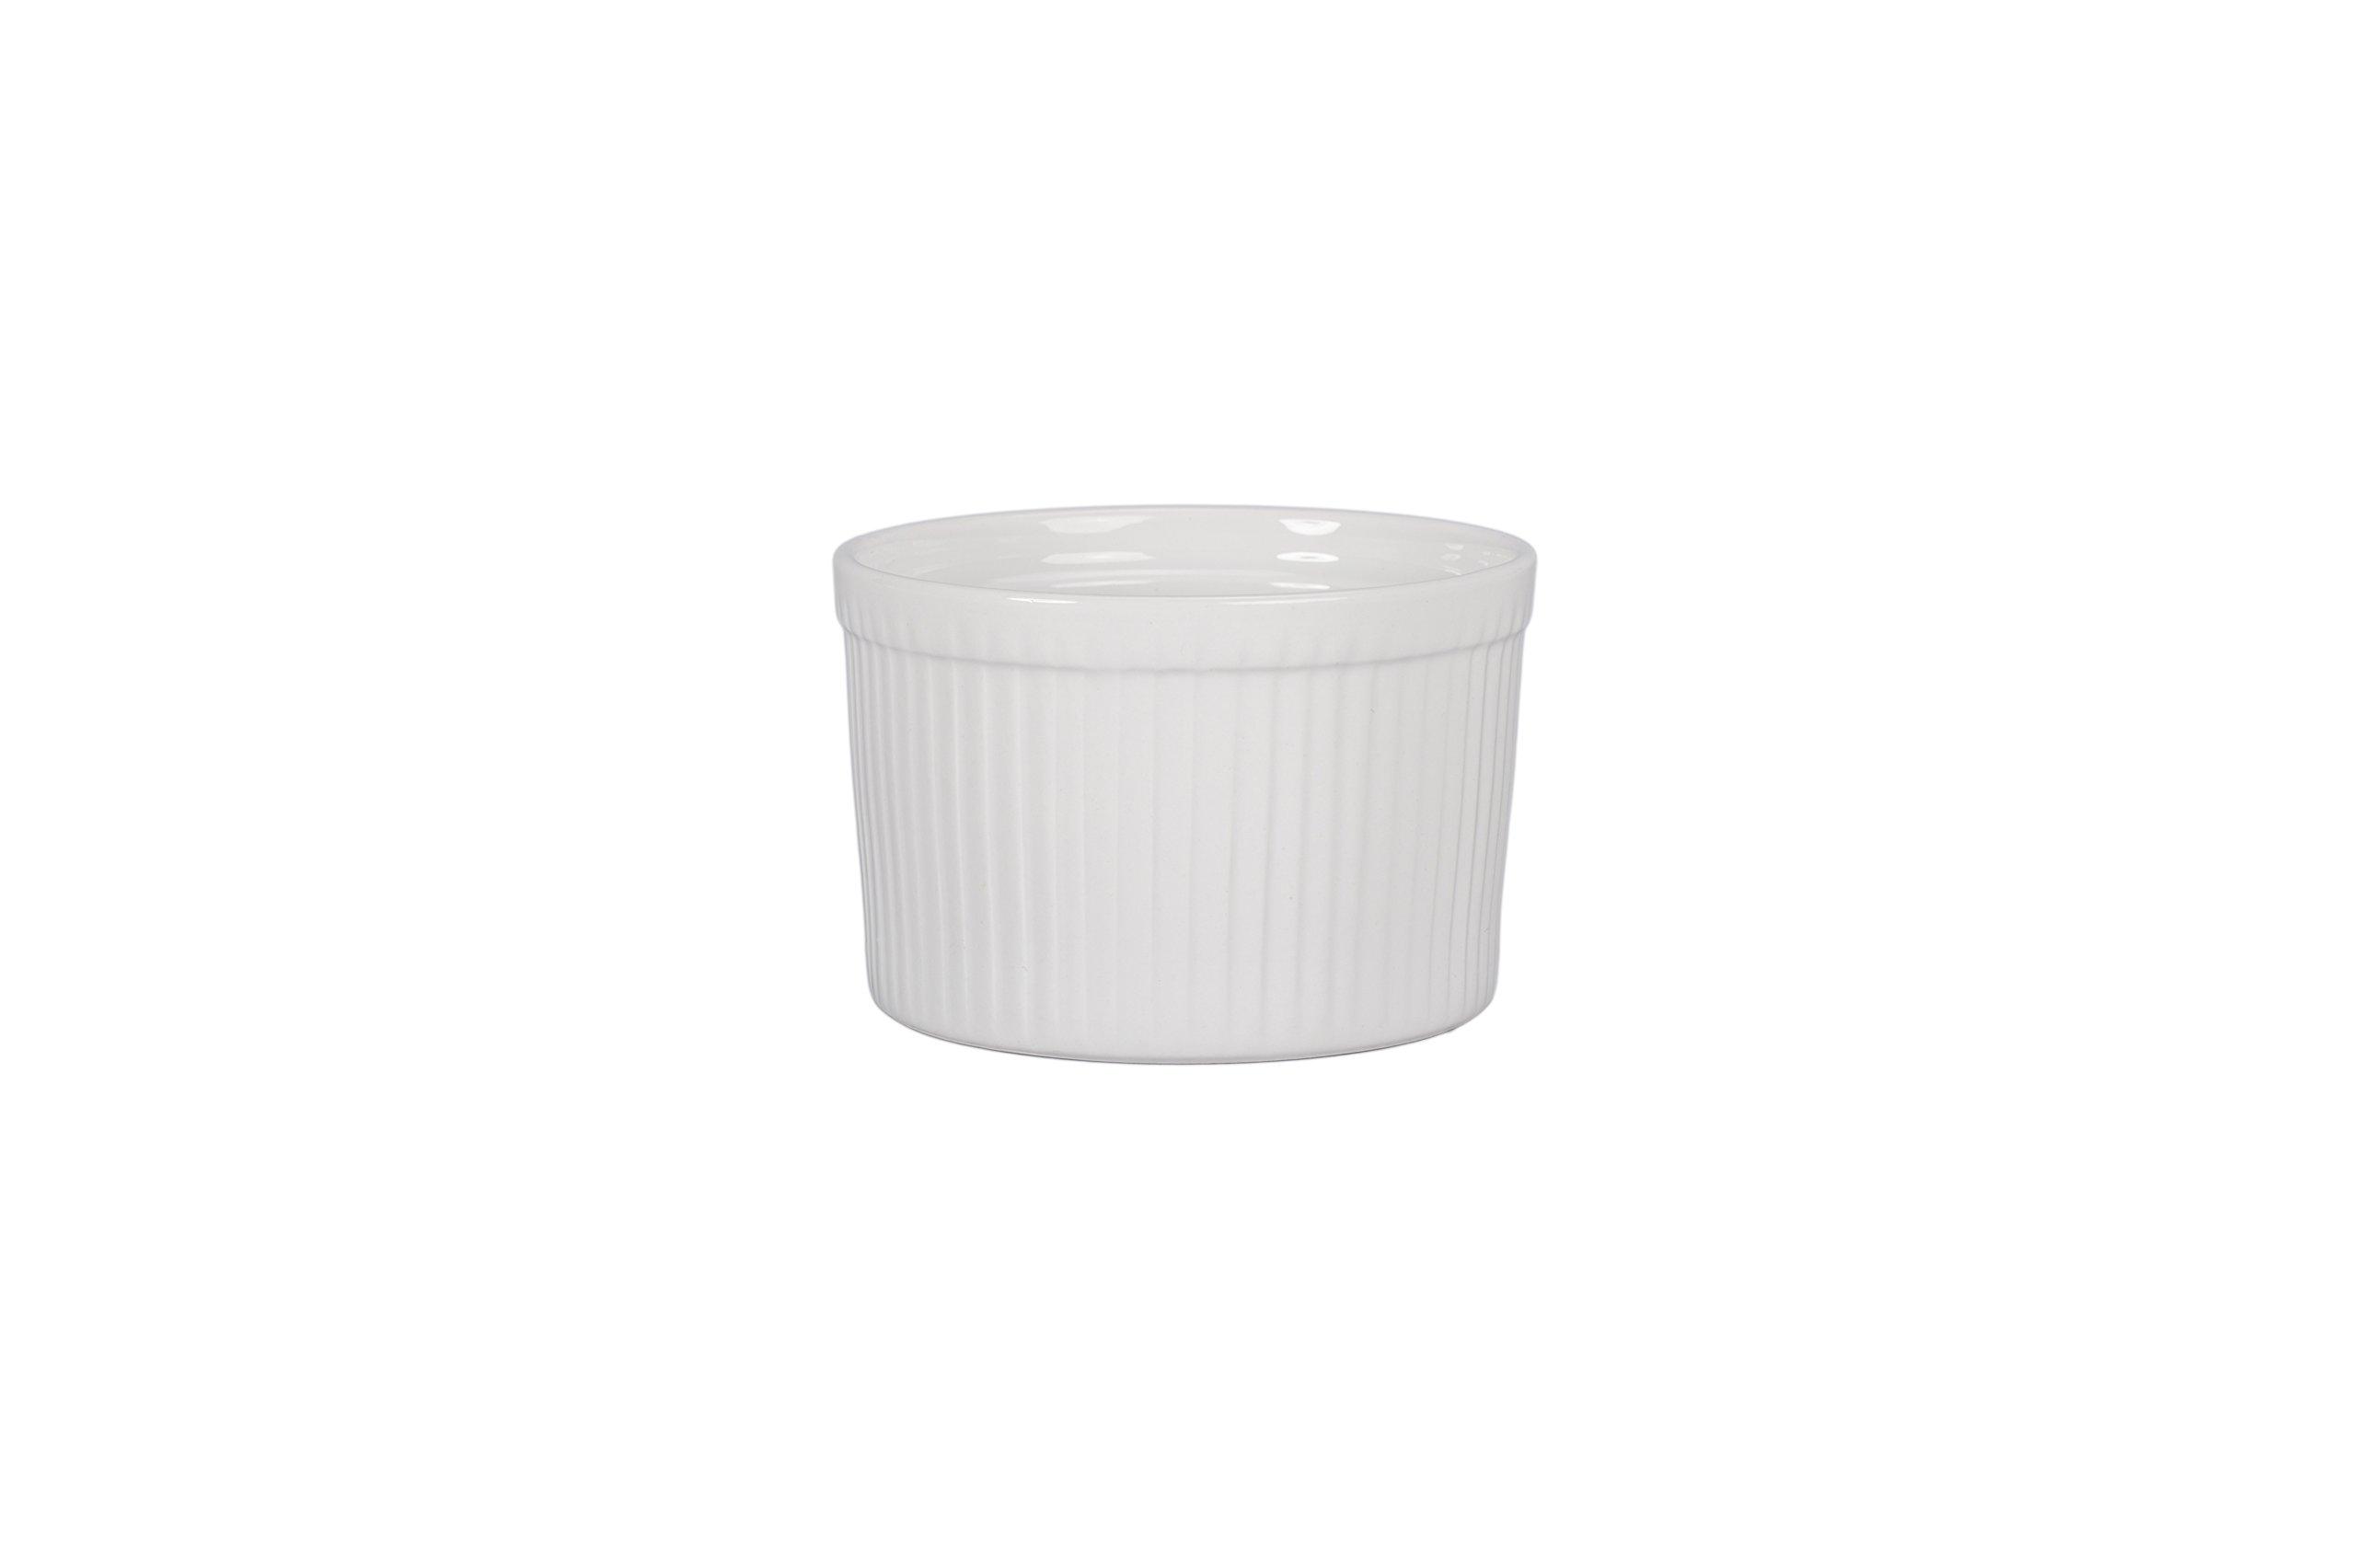 BIA Cordon Bleu 900020S4SIOC Classic Bakeware Souffle Dish, White by BIA Cordon Bleu